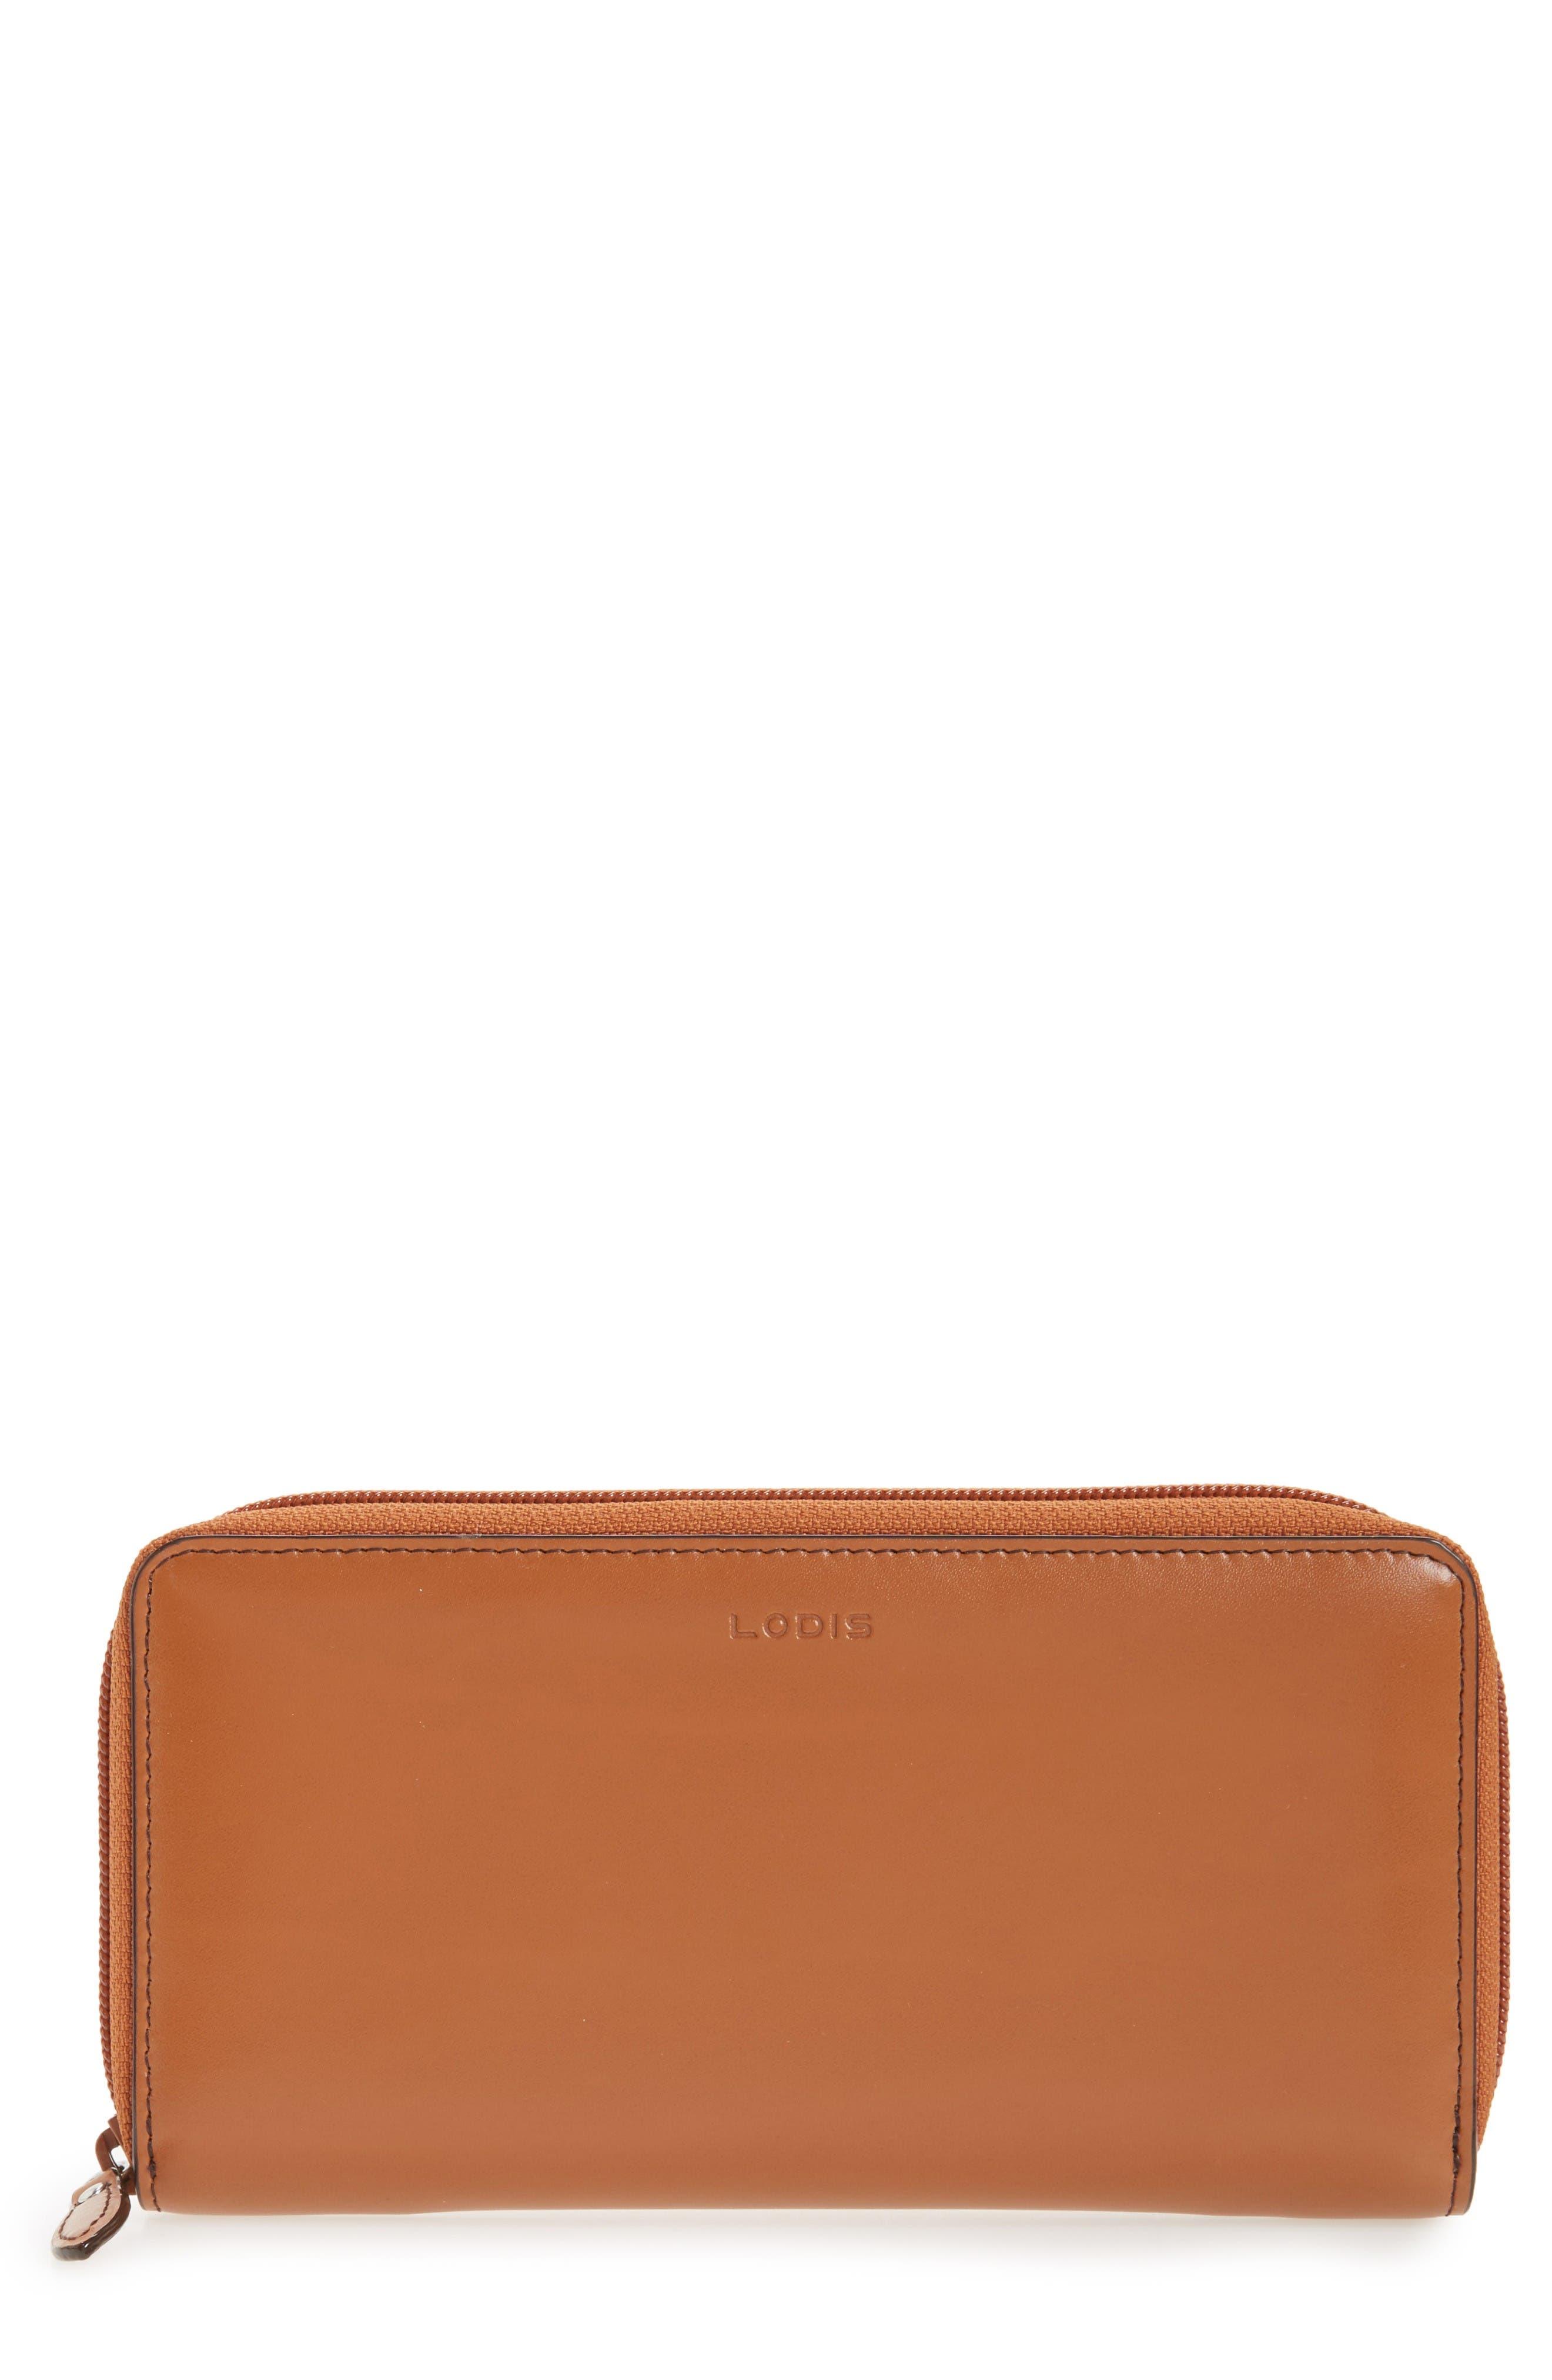 Lodis Ada RFID Zip Around Wallet,                         Main,                         color, Toffee